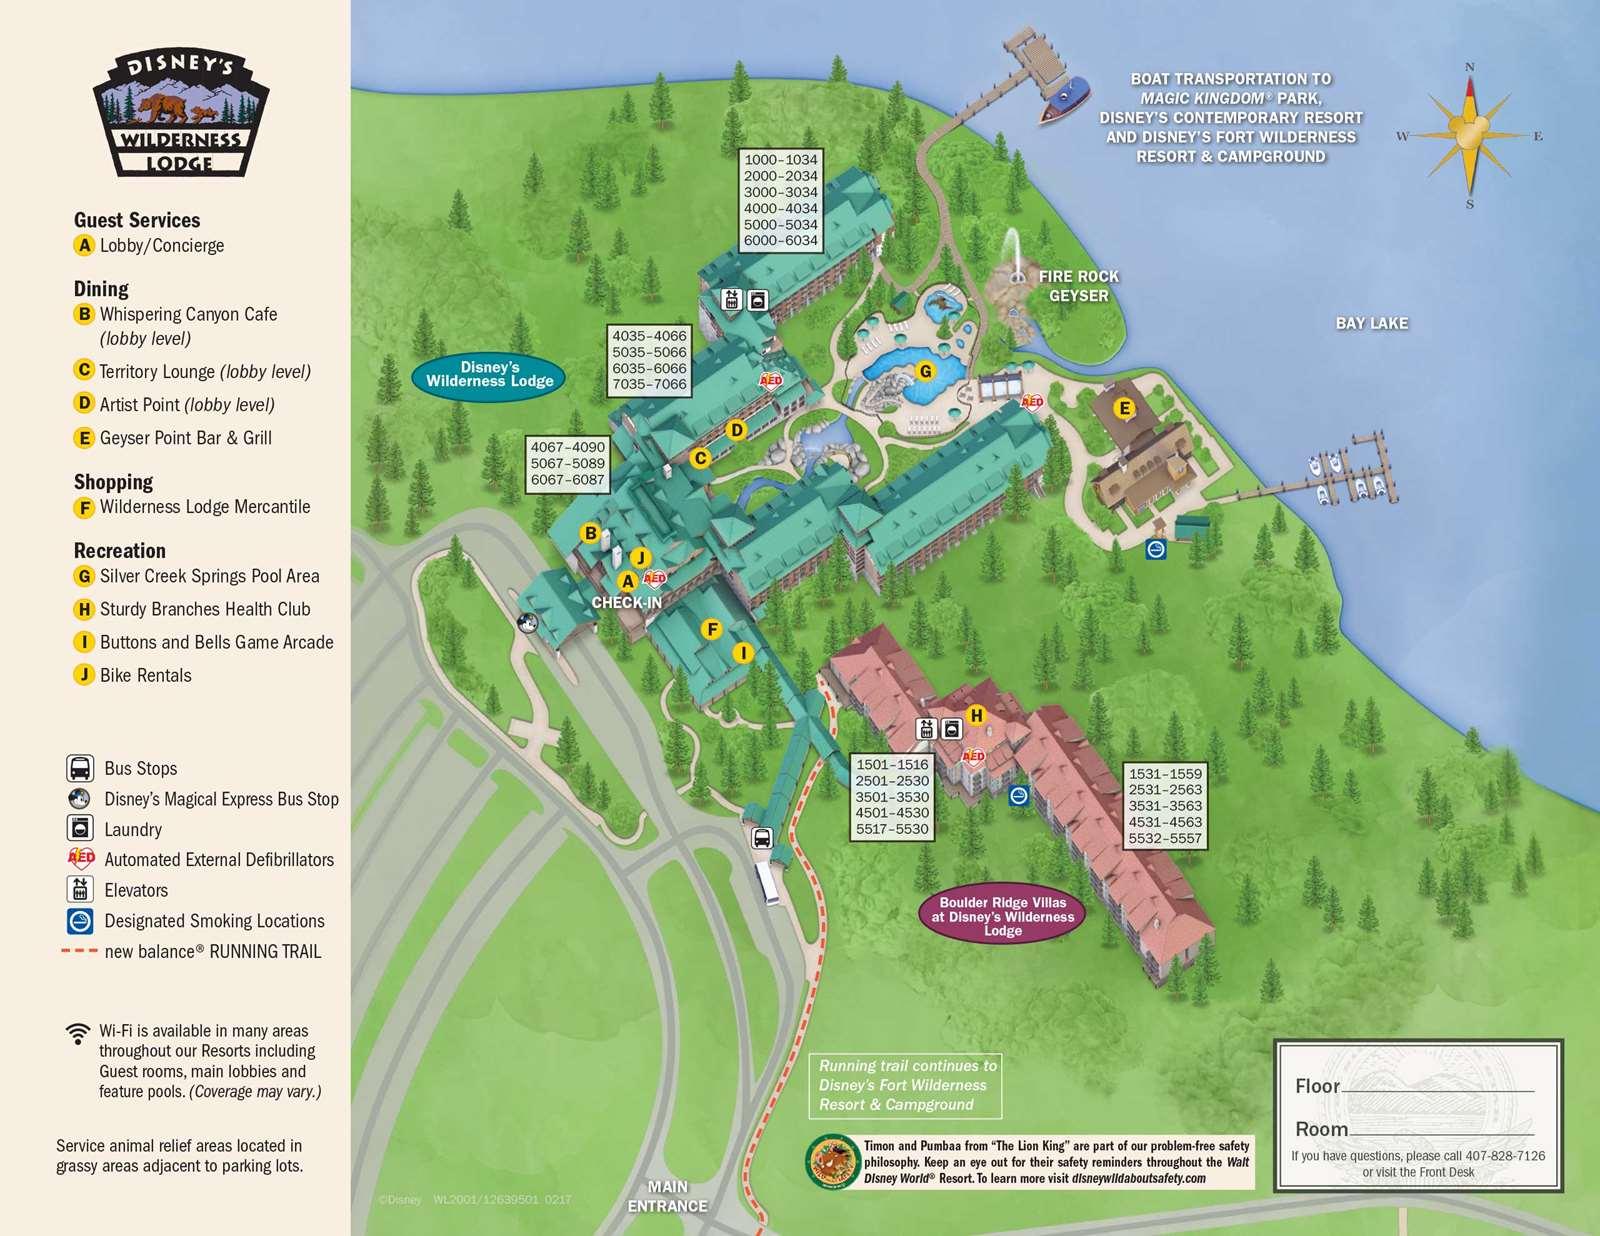 April 2017 Walt Disney World Resort Hotel Maps - Photo 30 of 33